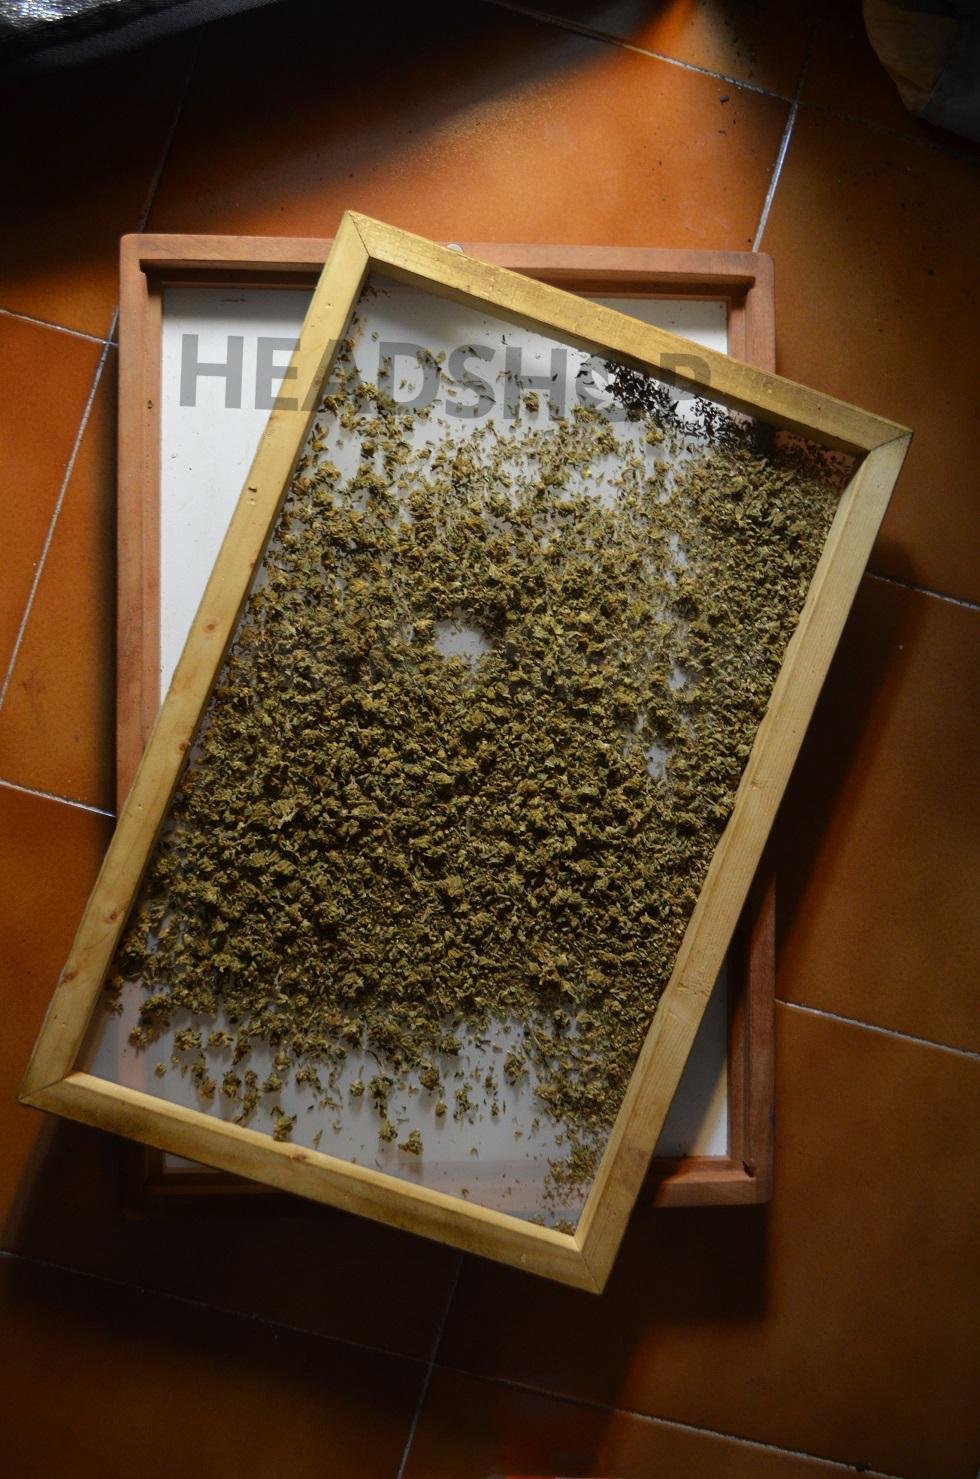 Tan Tam lleno de marihuana resinosa